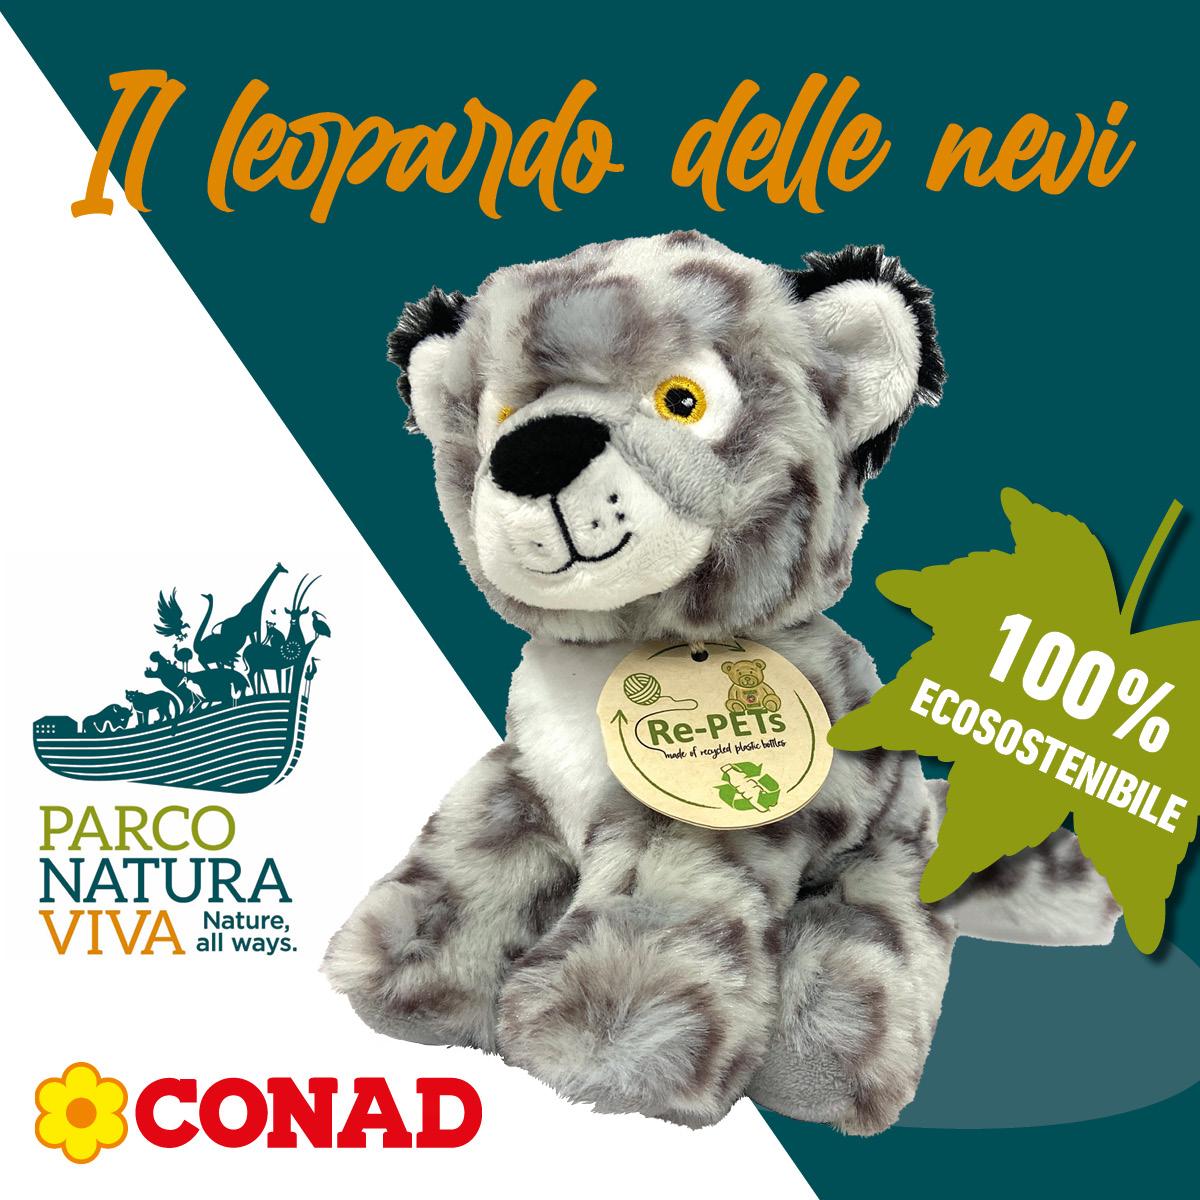 Parco Natura Viva peluche leopardo delle nevi